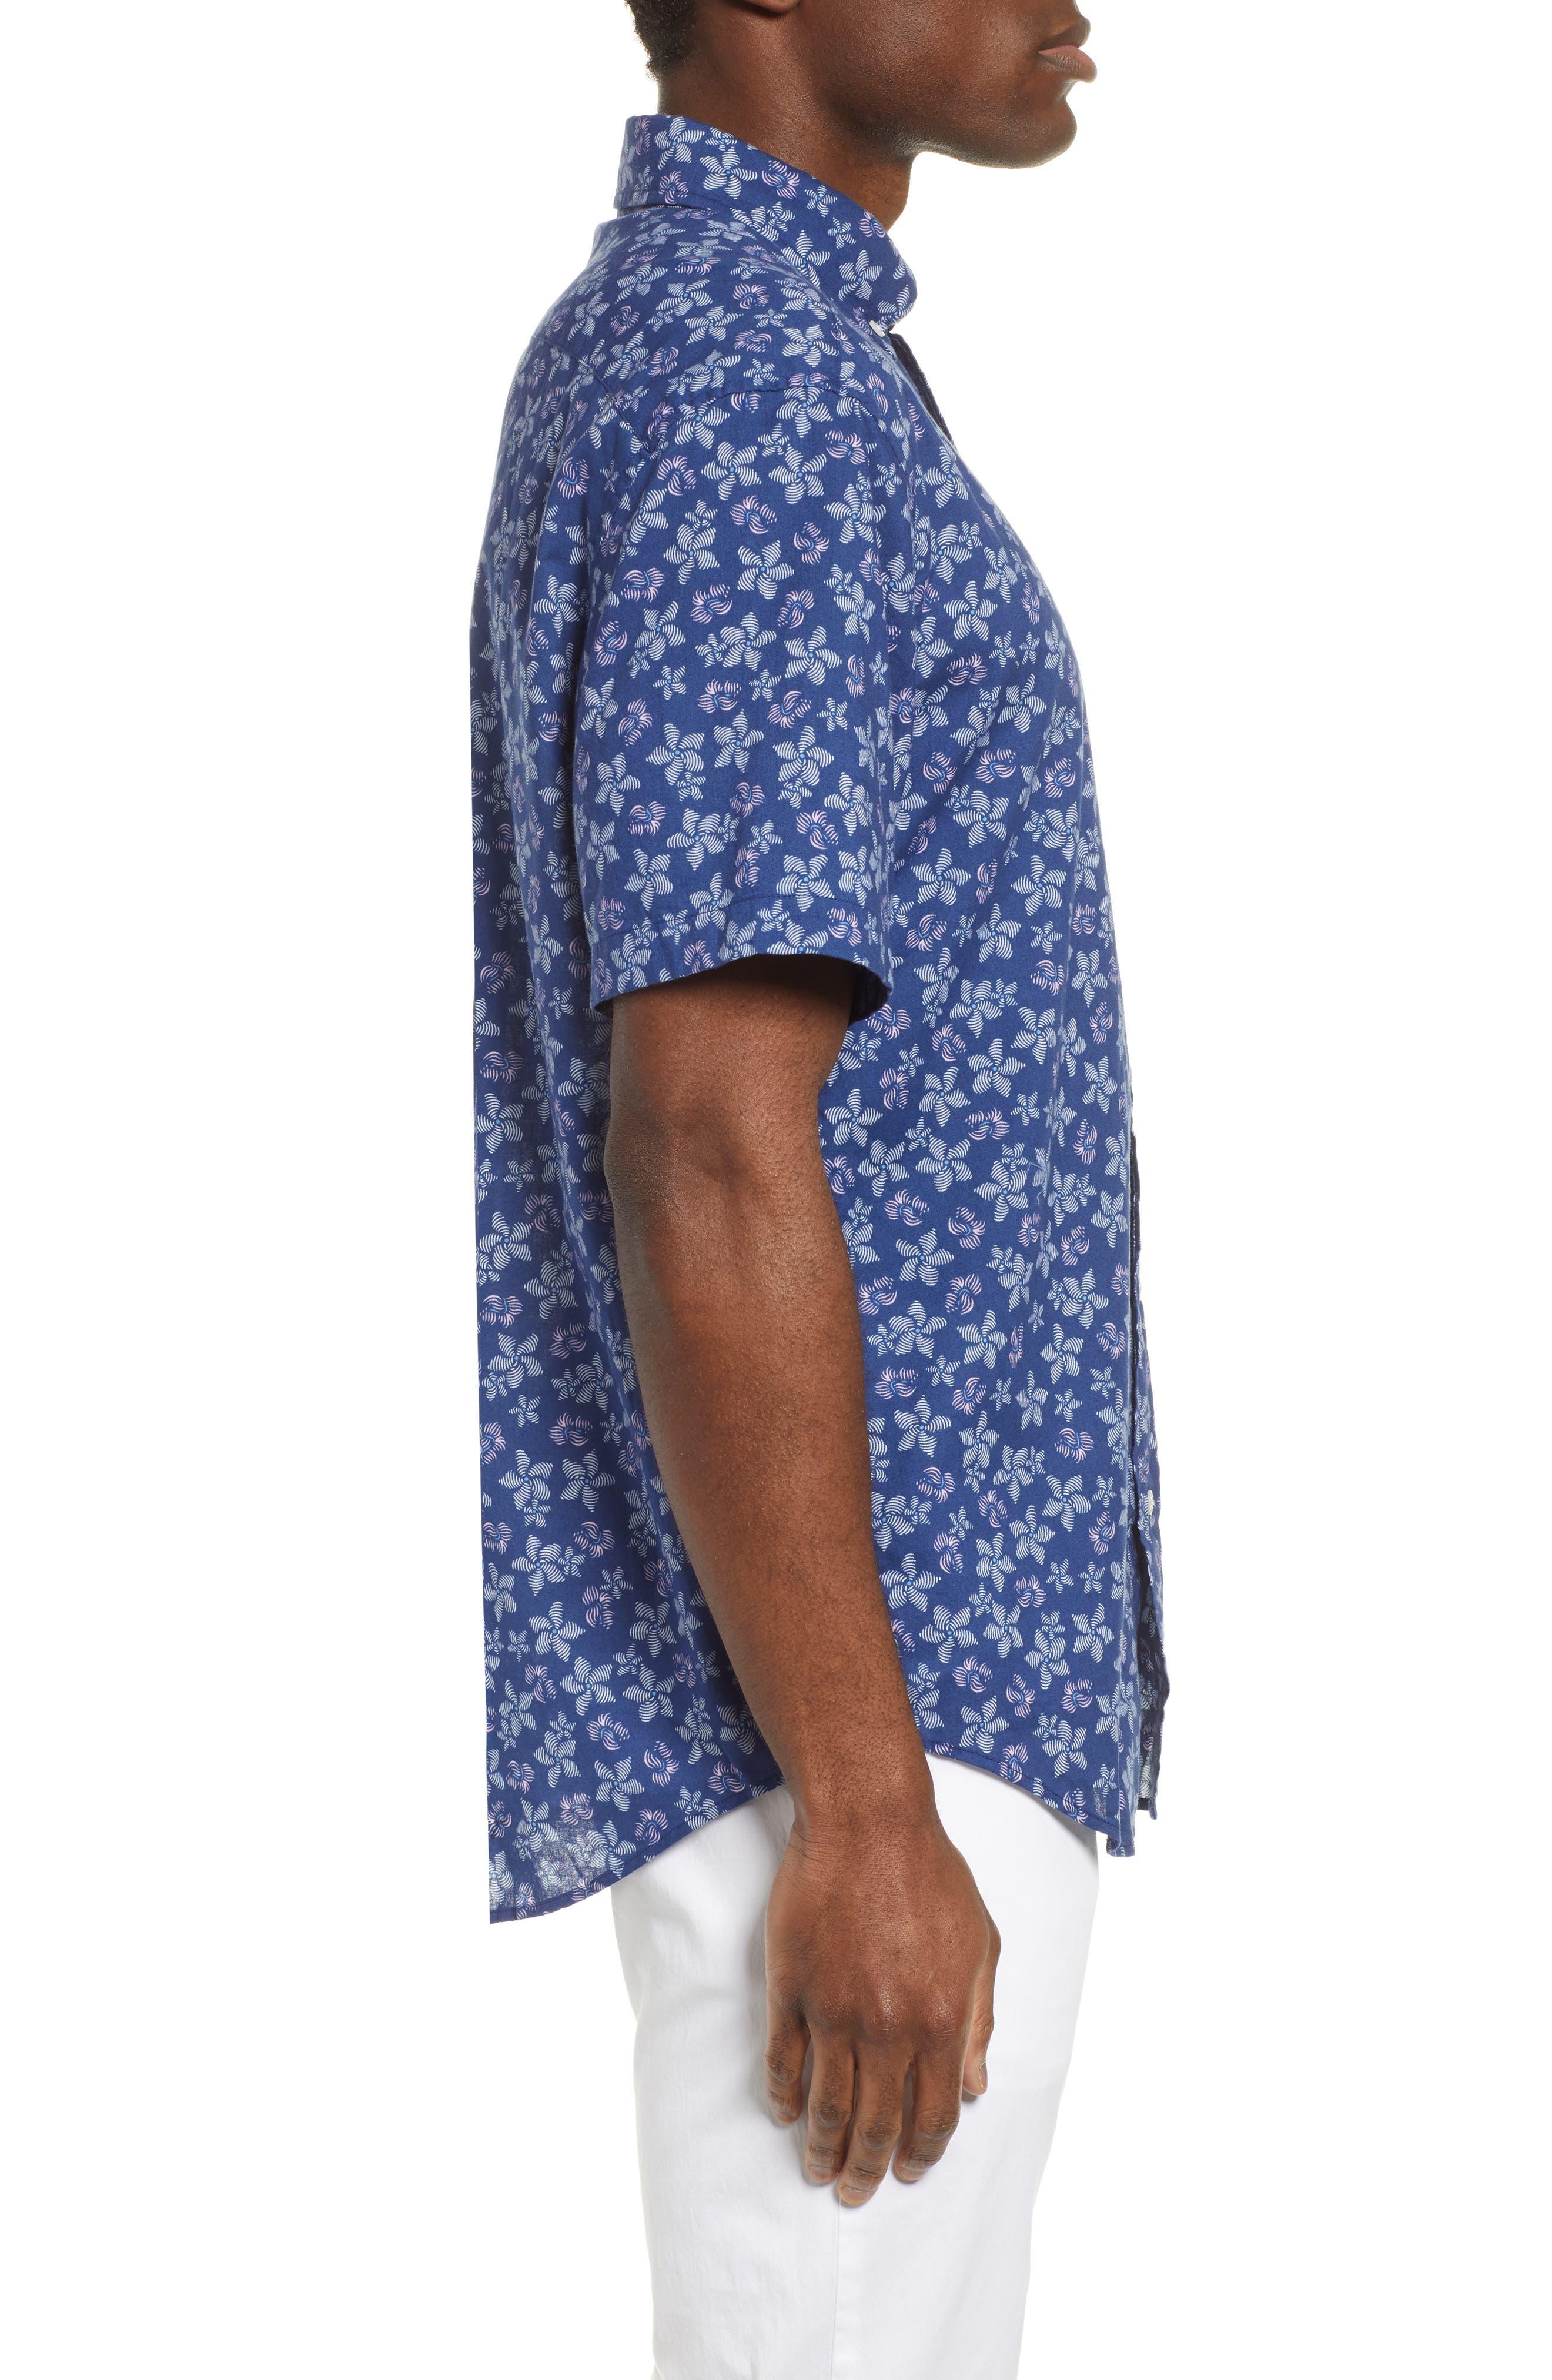 VINEYARD VINES, Murray Slim Fit Floral Print Sport Shirt, Alternate thumbnail 4, color, DEEP BAY